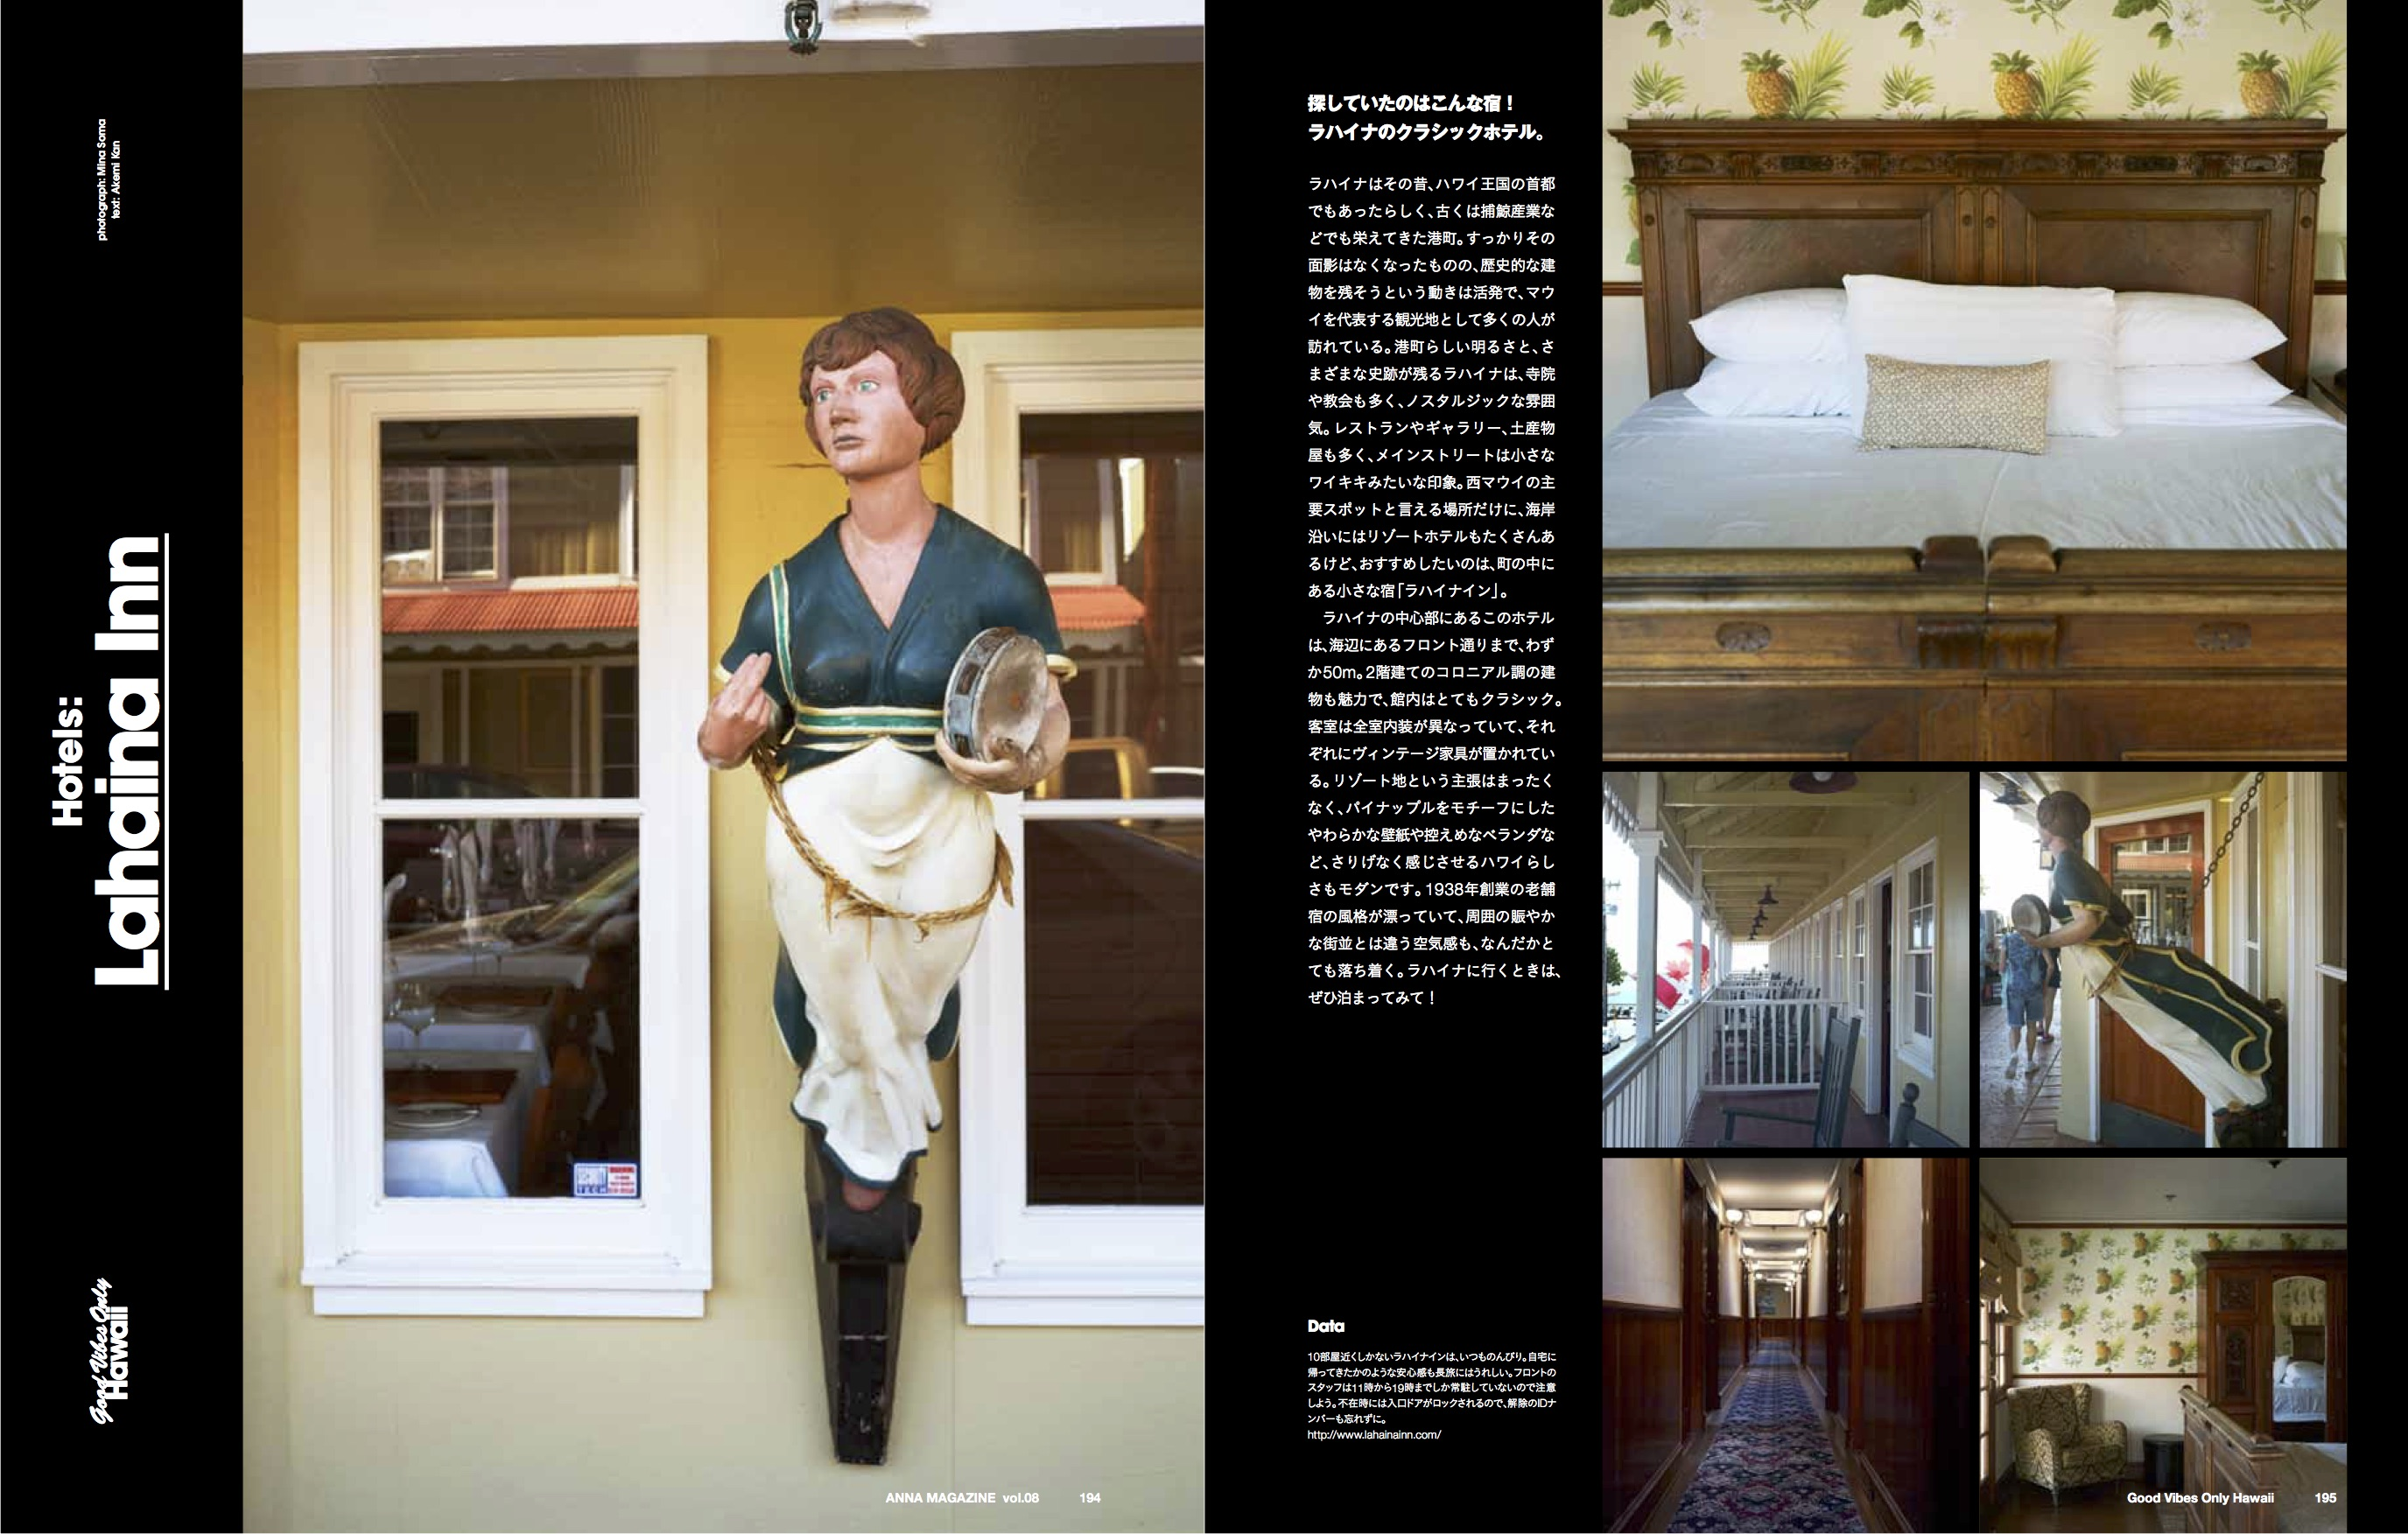 anna magazine vol.8 P98